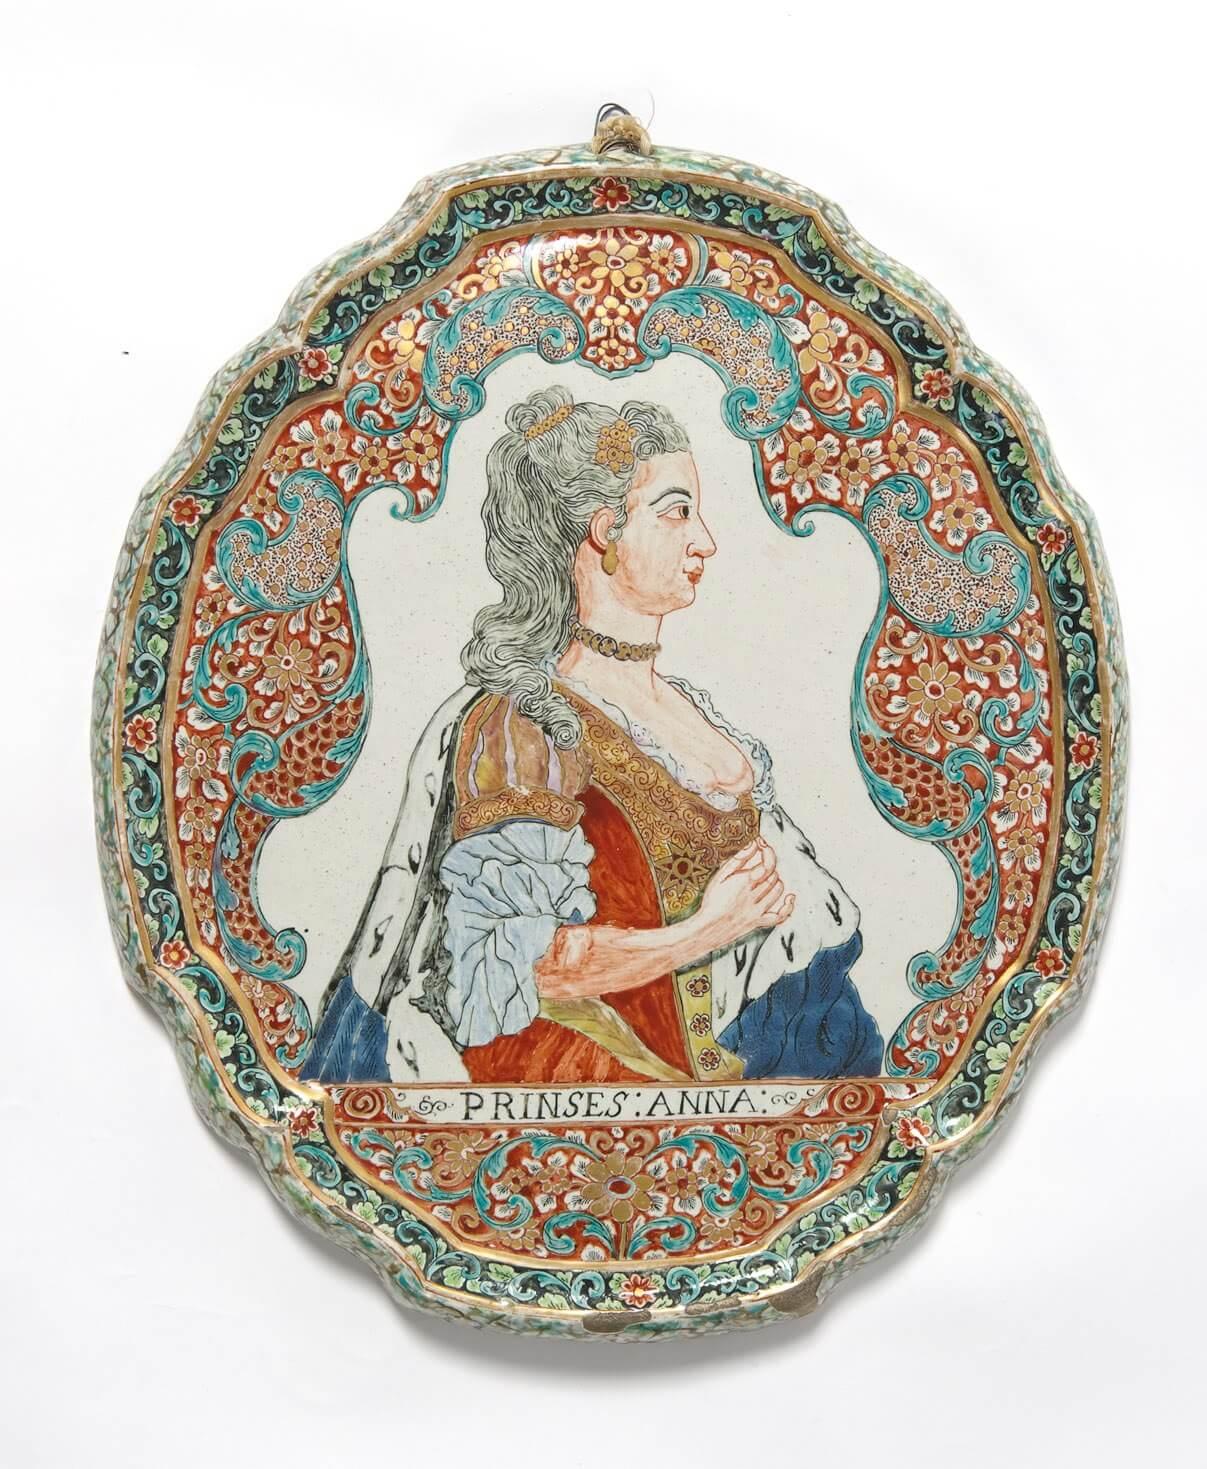 Antique pottery plaque of Princess Anna spouse to William IV